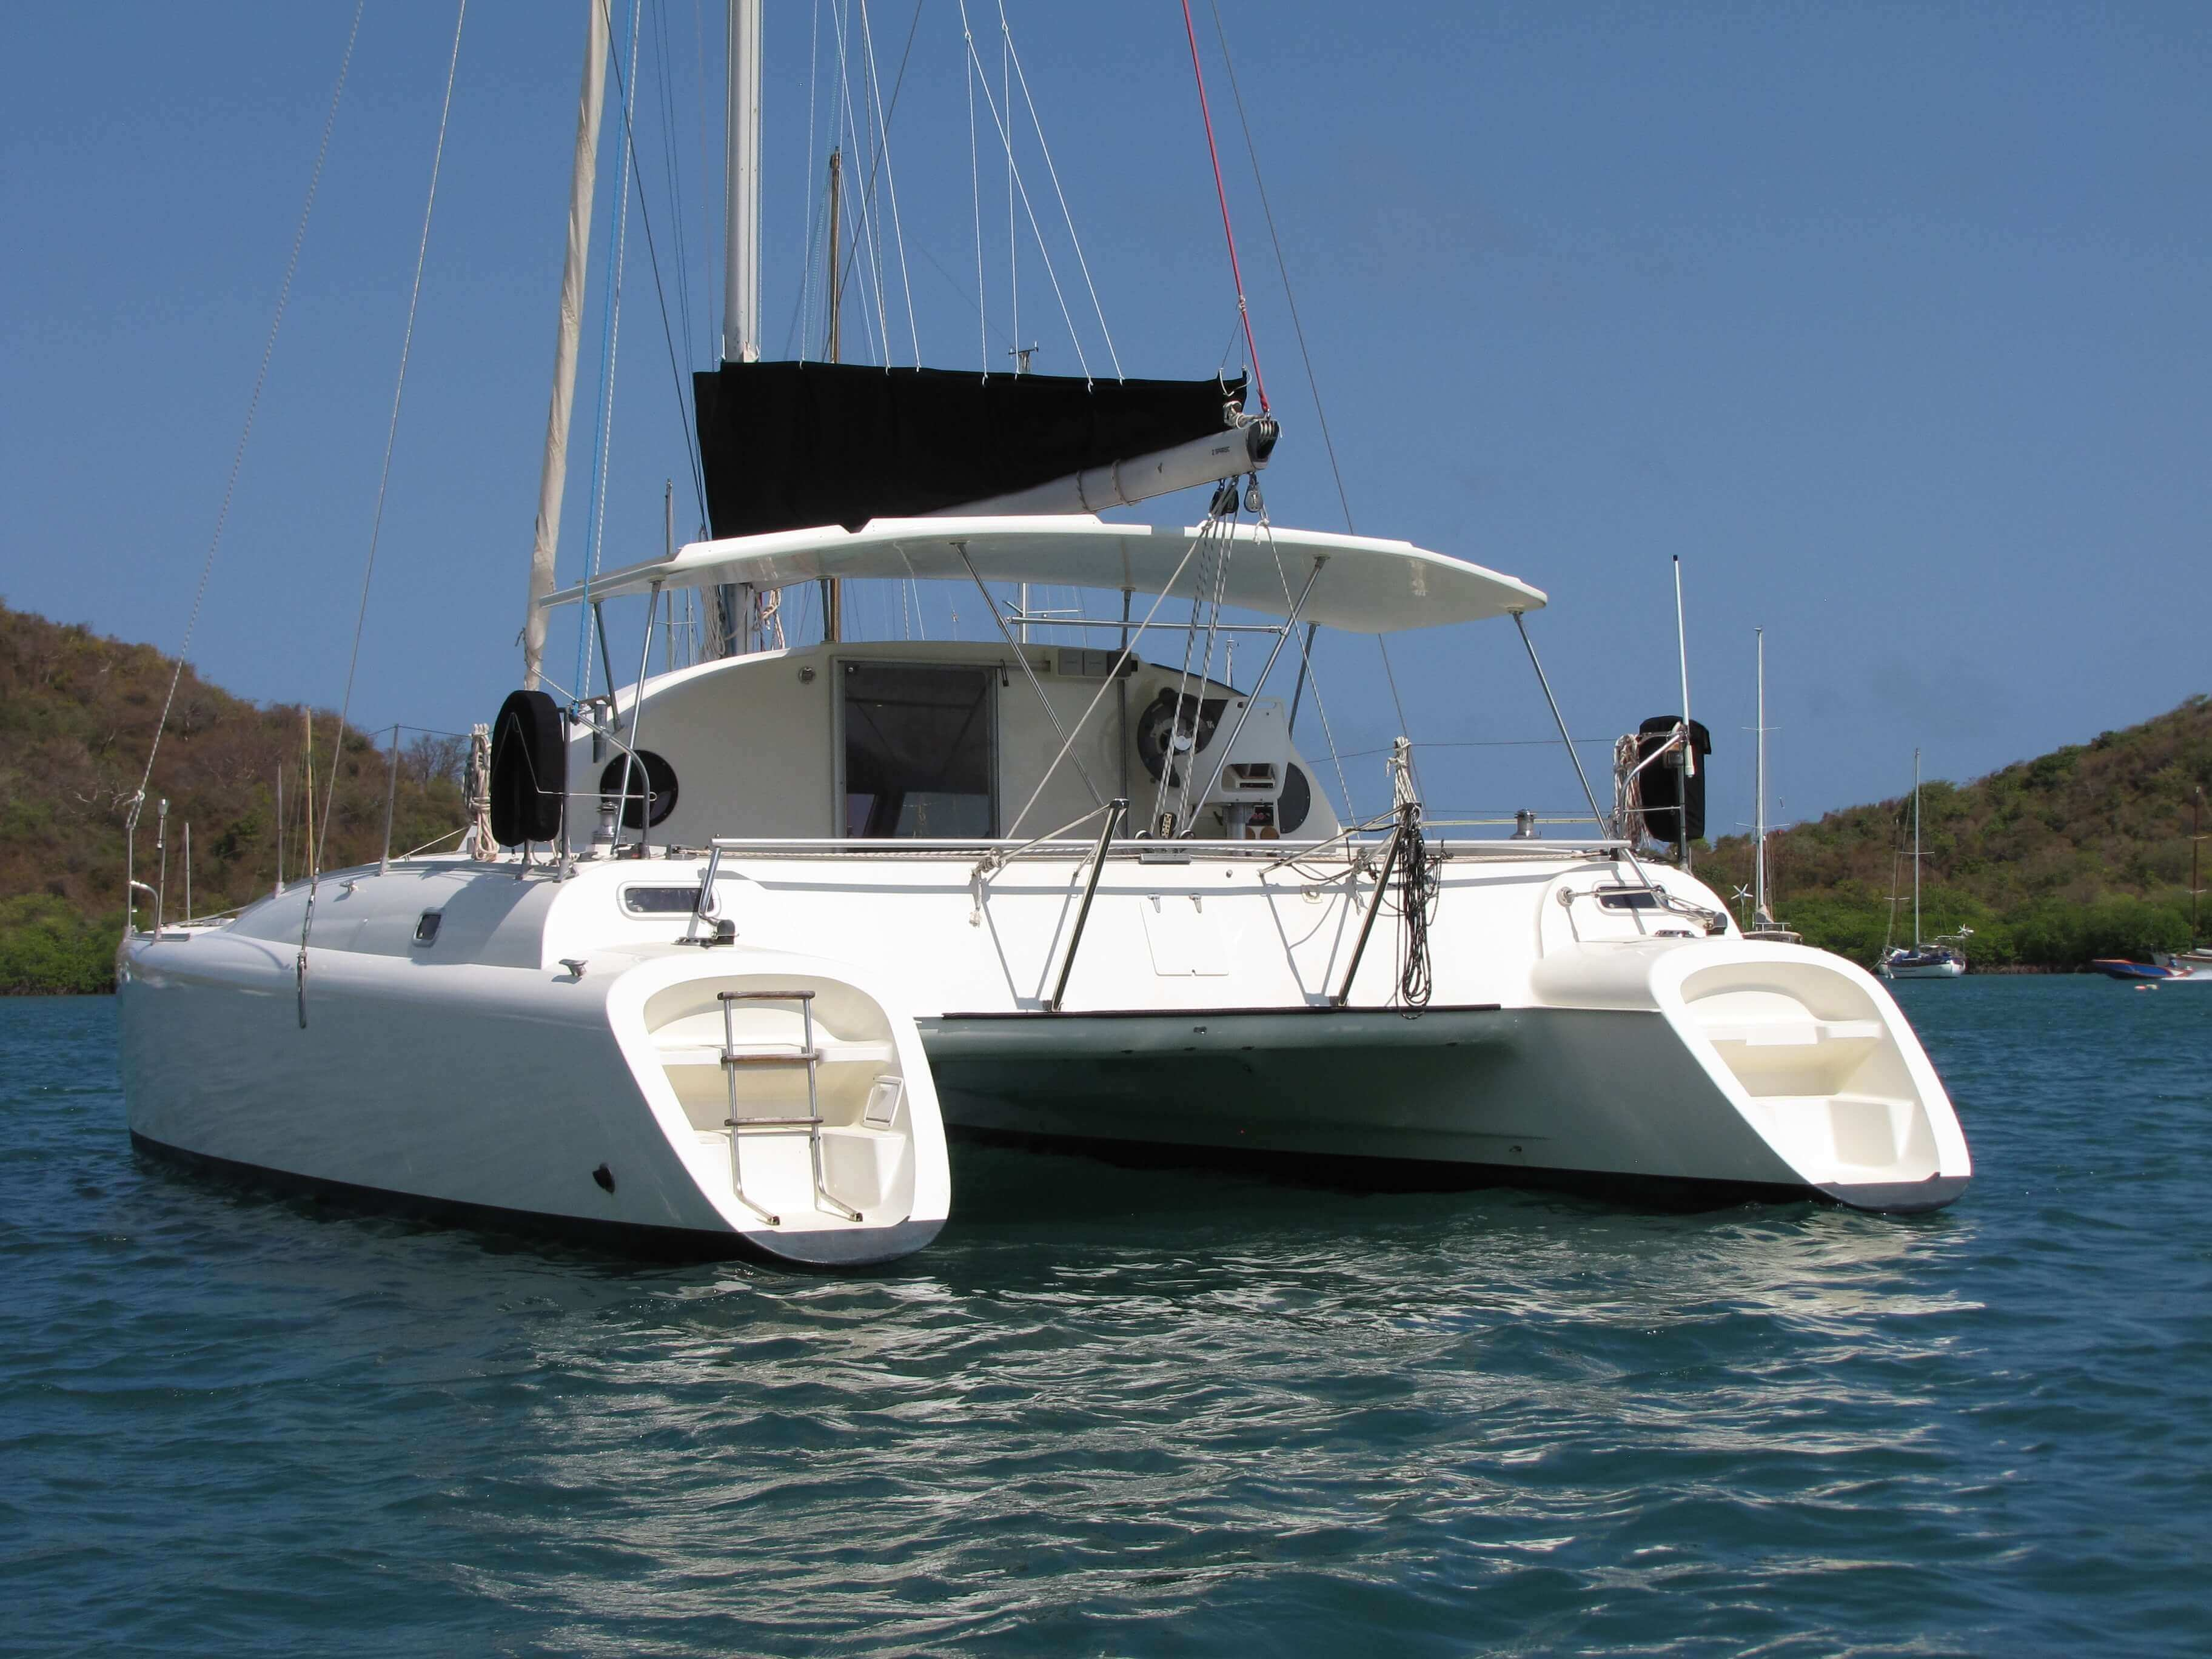 Used Sail Catamaran for Sale 1992 Antigua Maestro 37 Boat Highlights